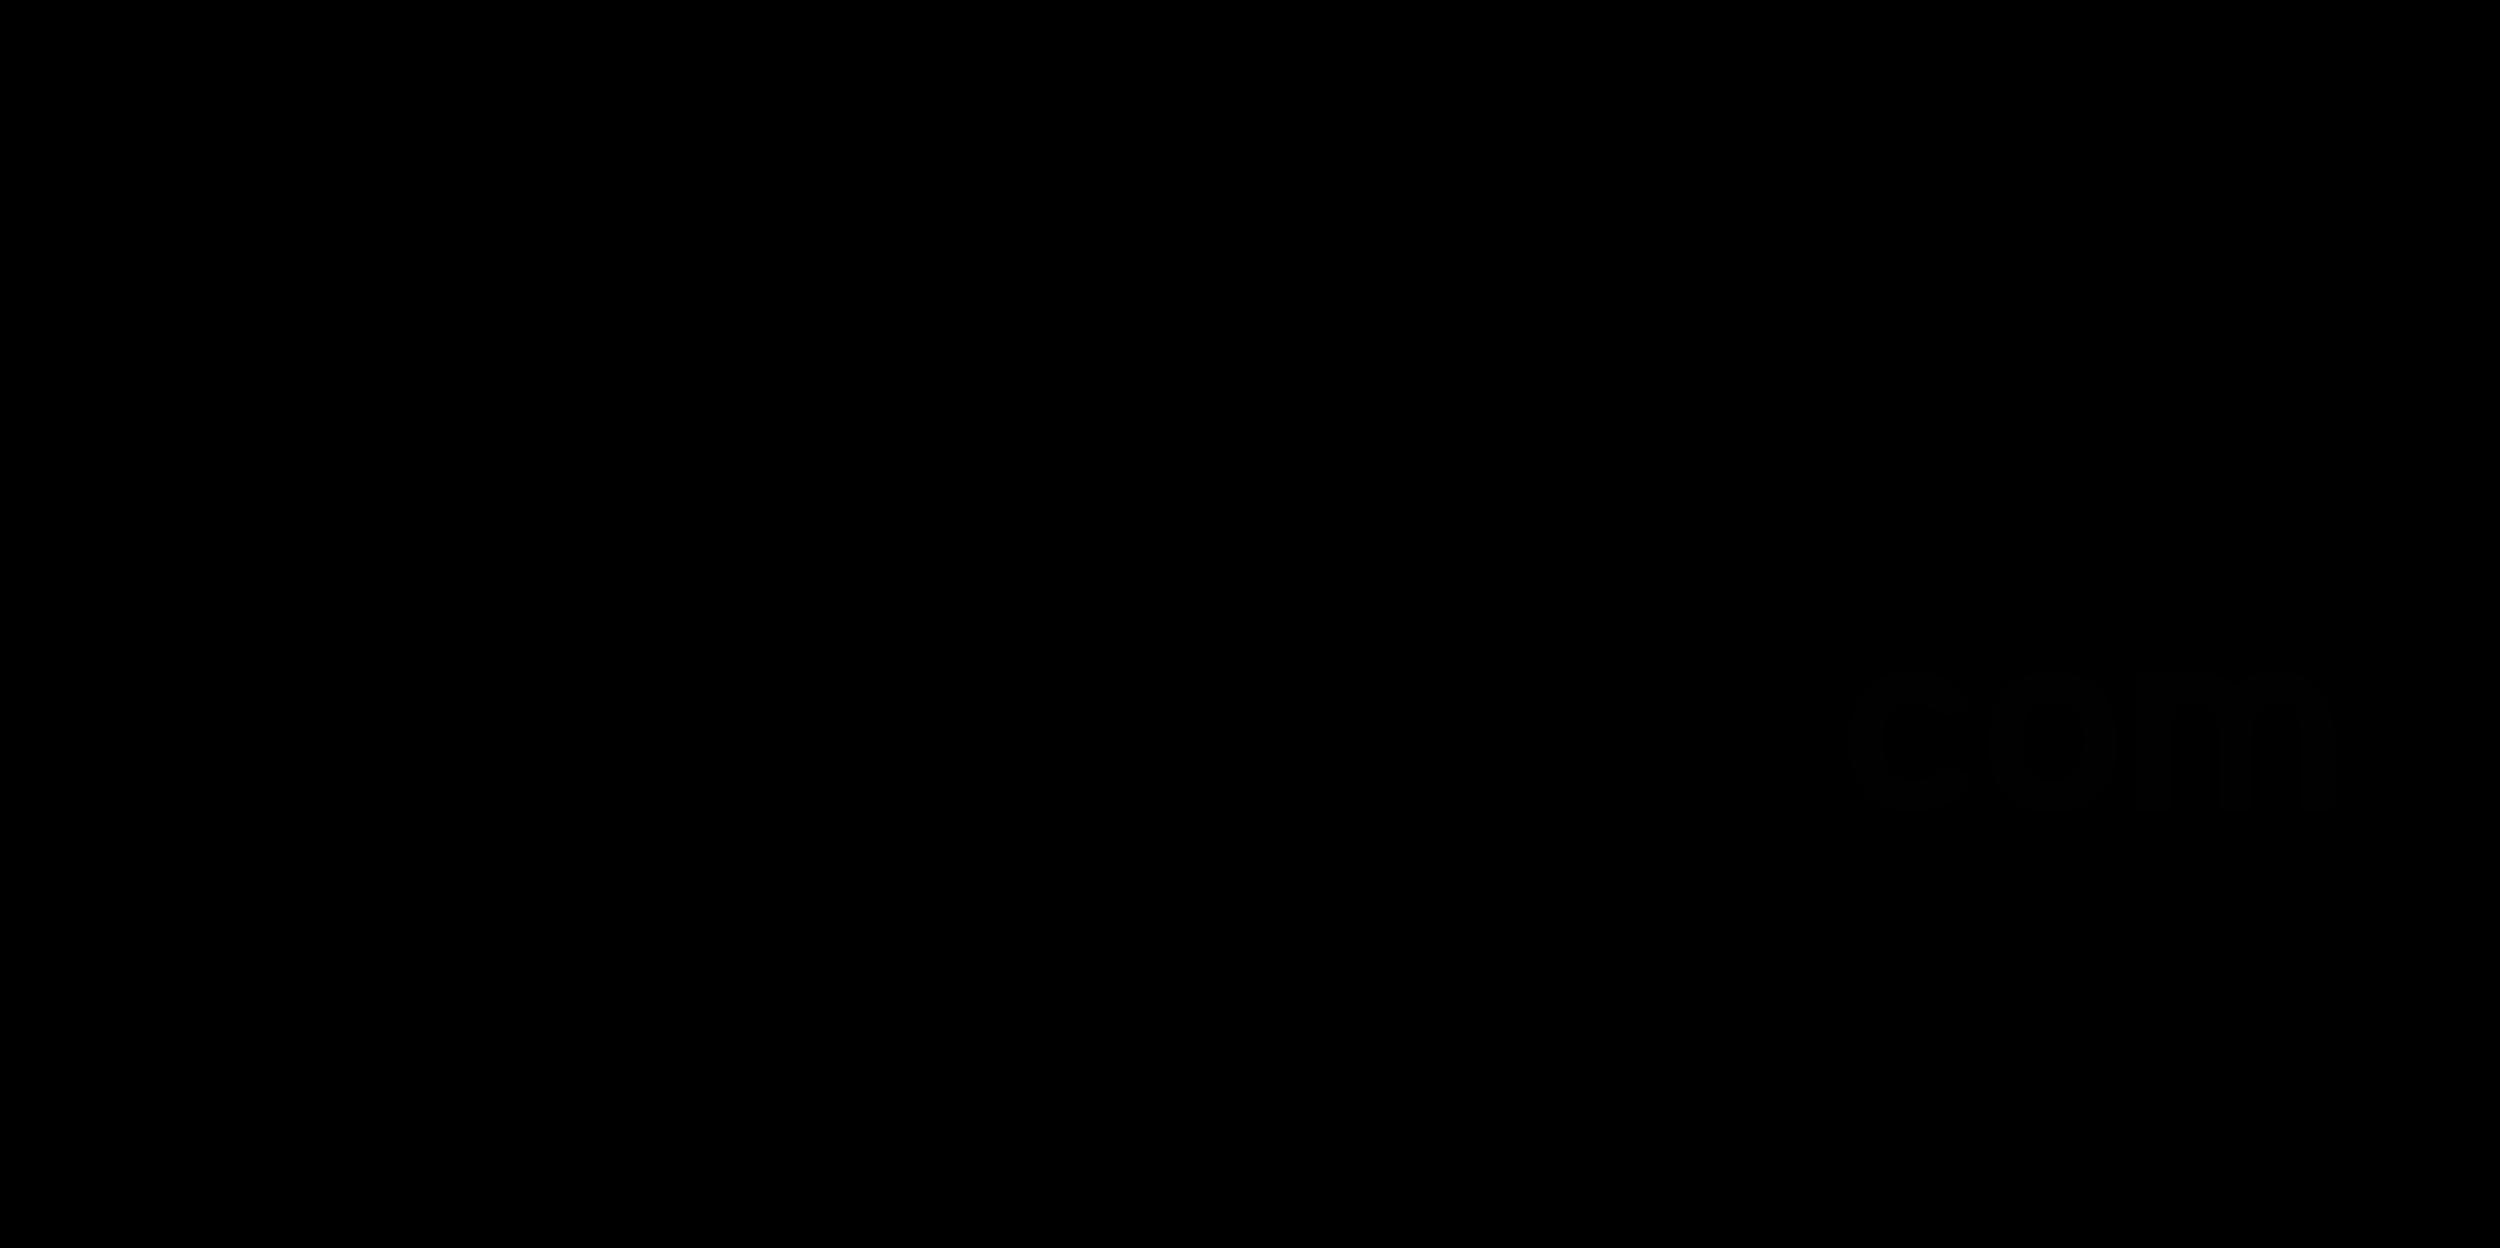 LOGO_HARTZINE_COM_HD